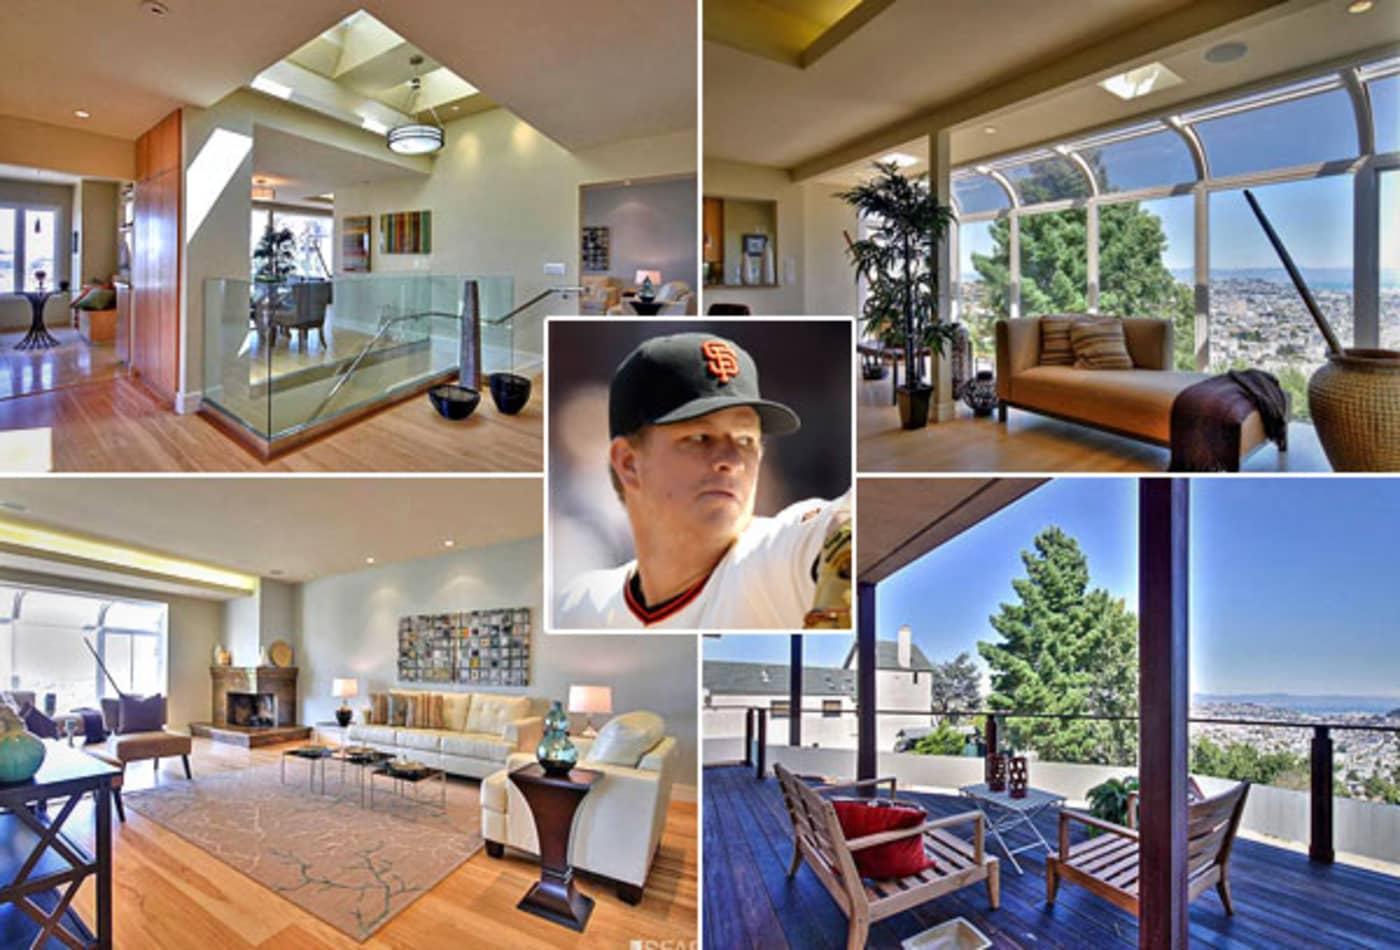 Matt-Cain-Baseball-Homes-CNBC.jpg